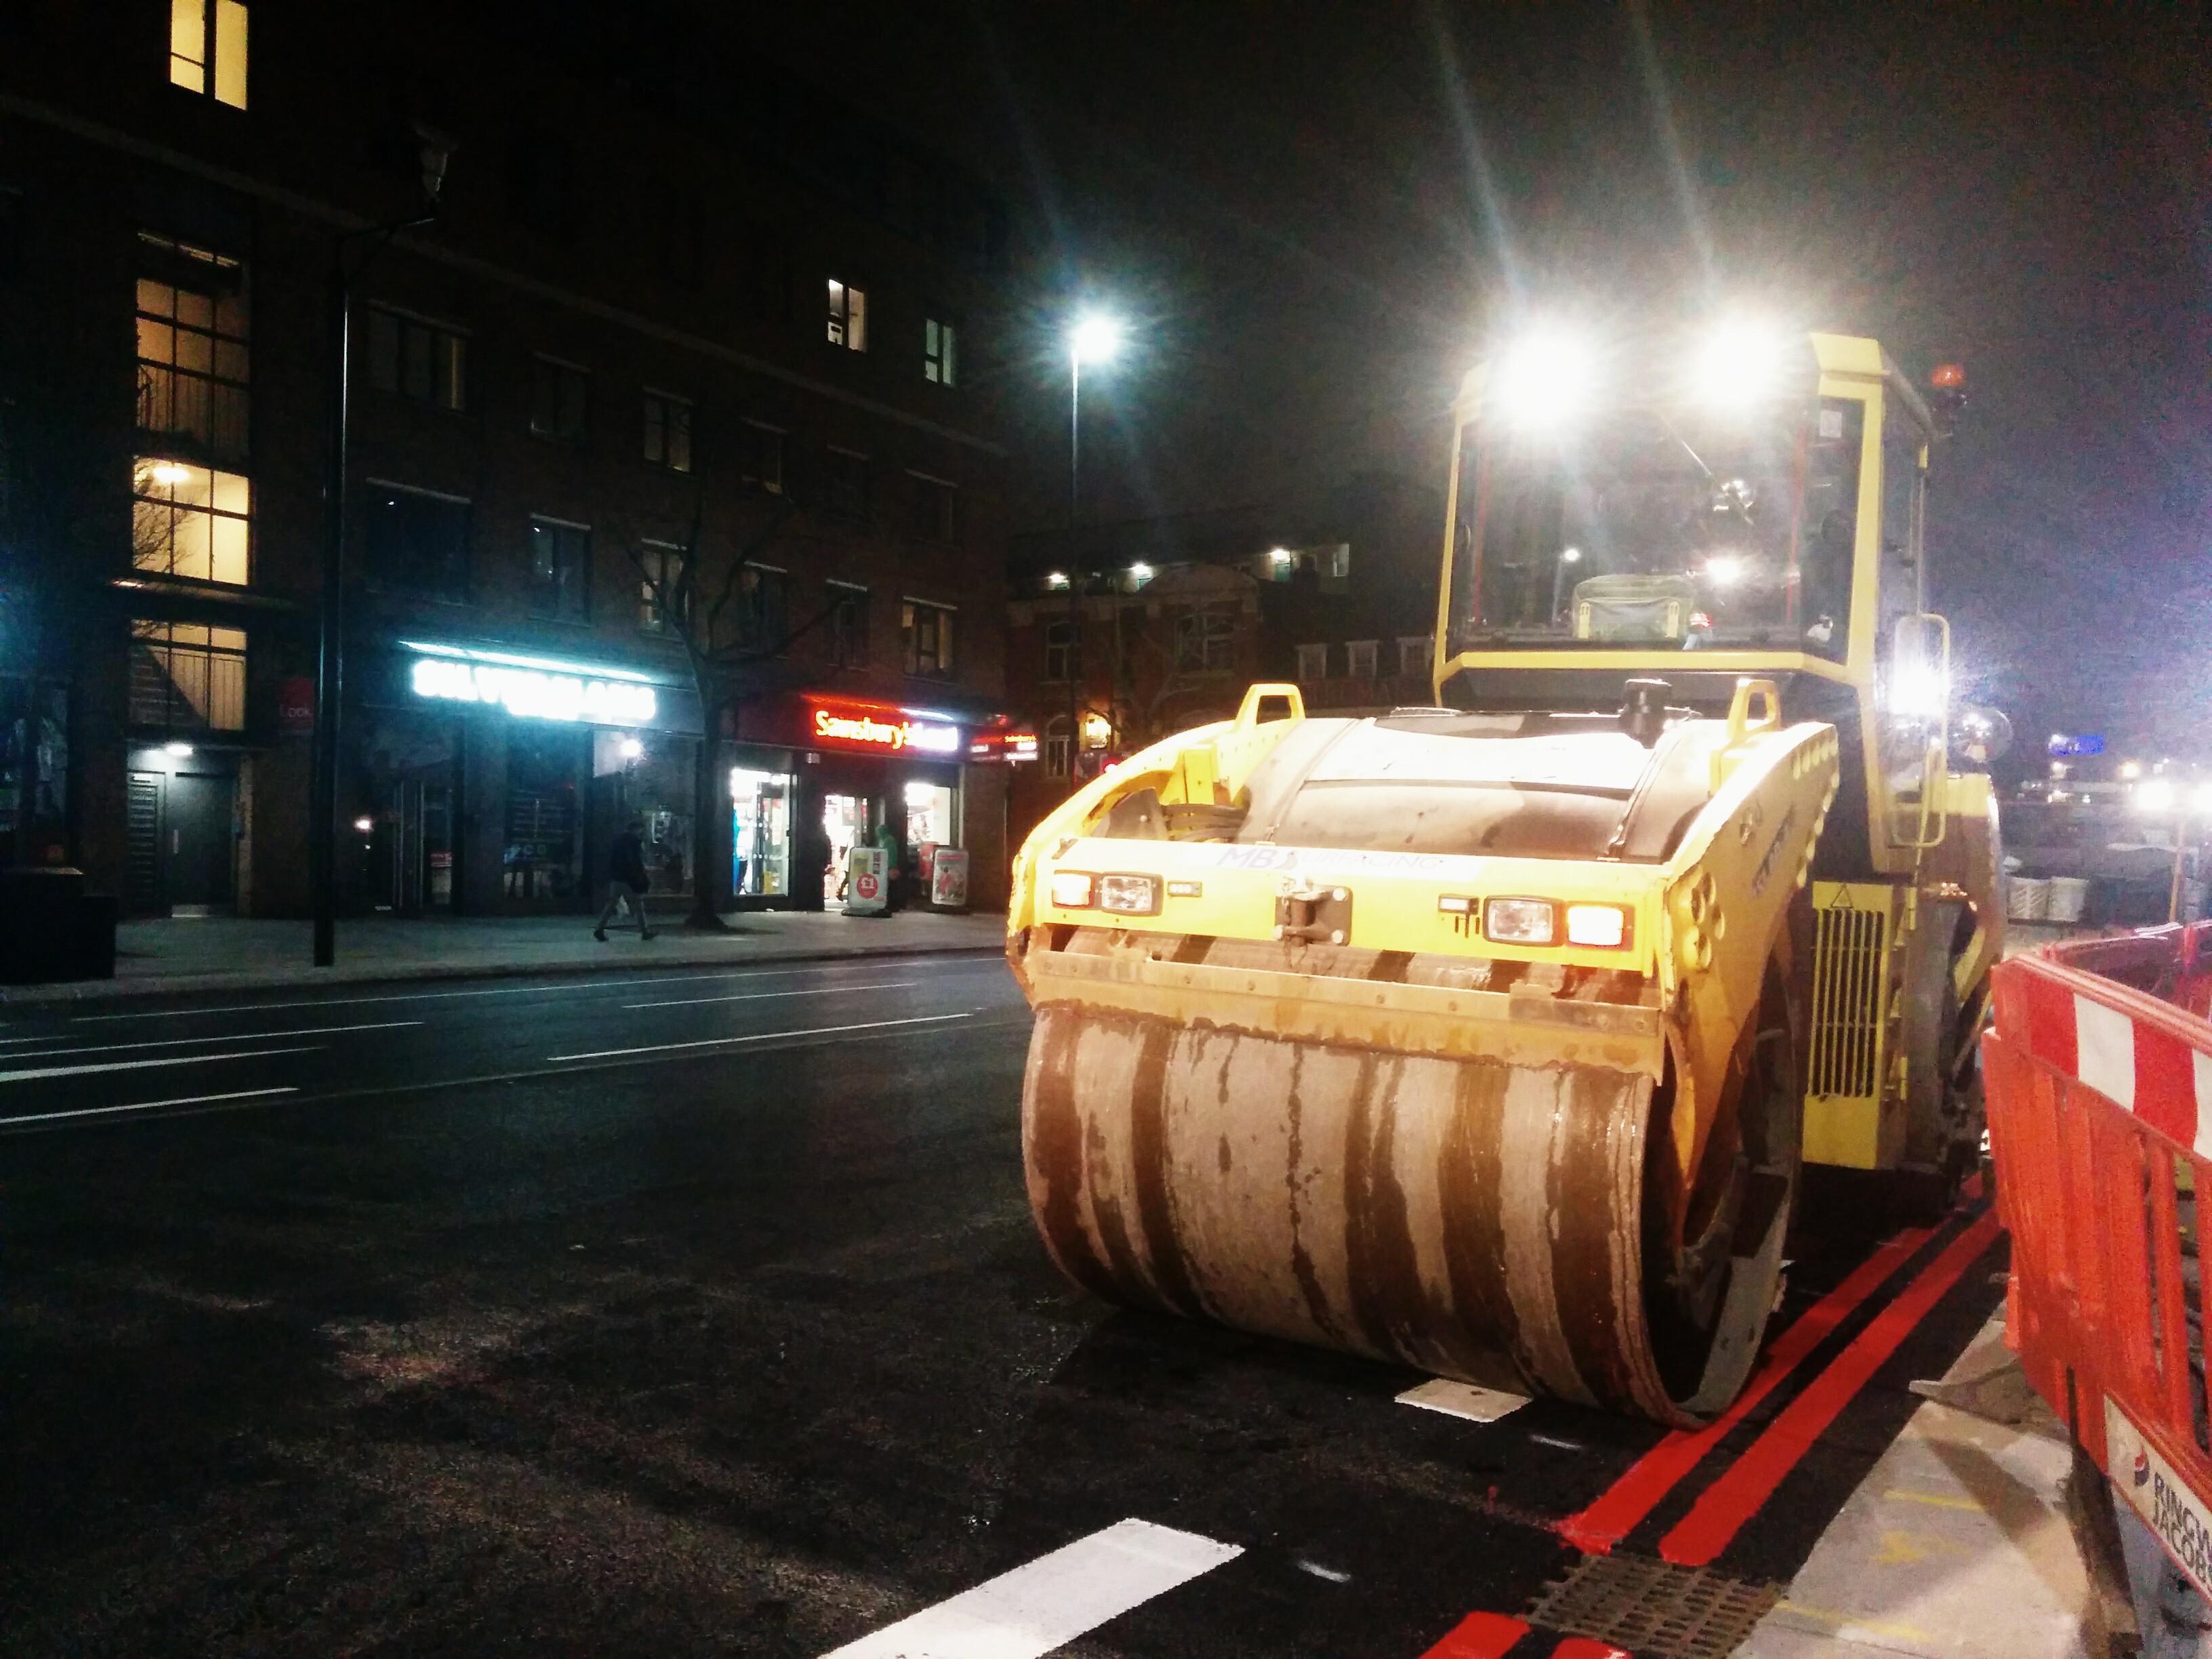 Road surface machinery at night Stepney Green